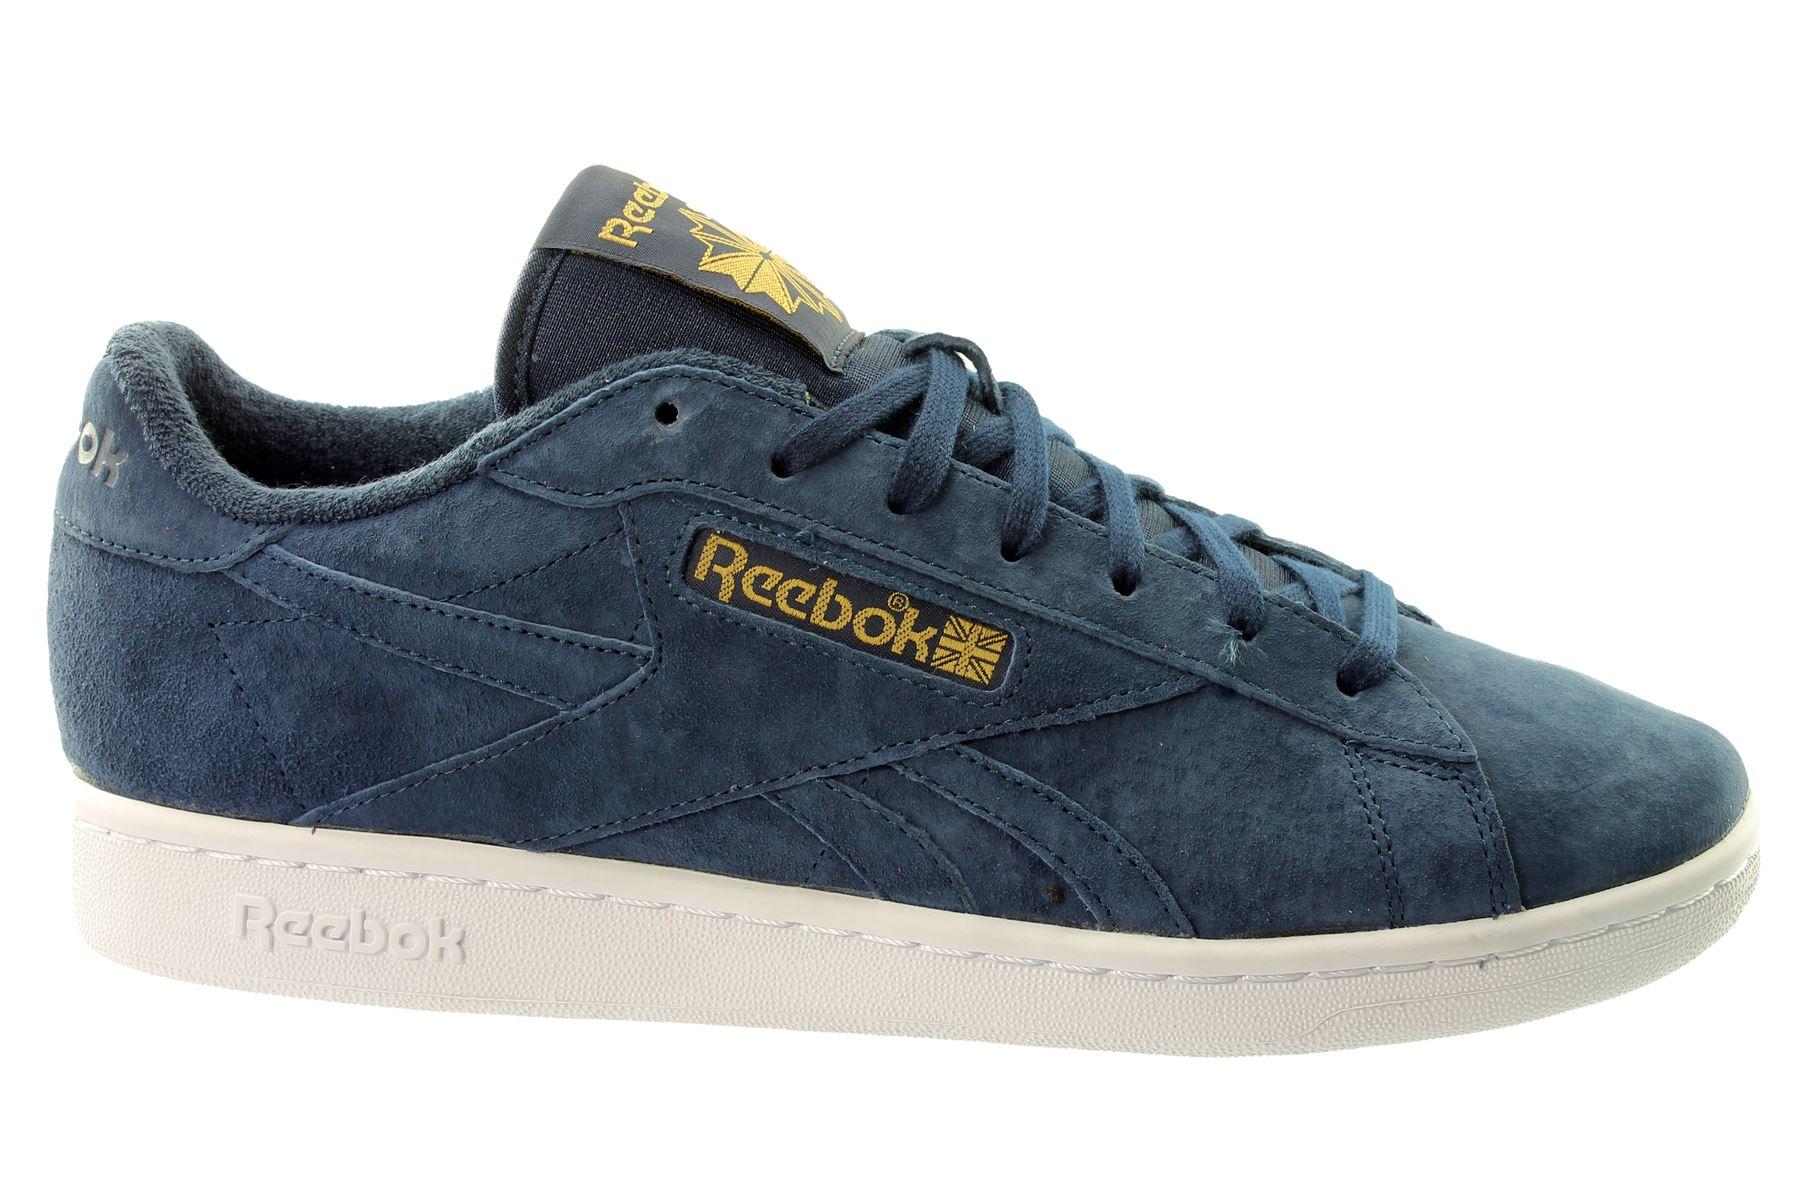 Reebok Blue Suede